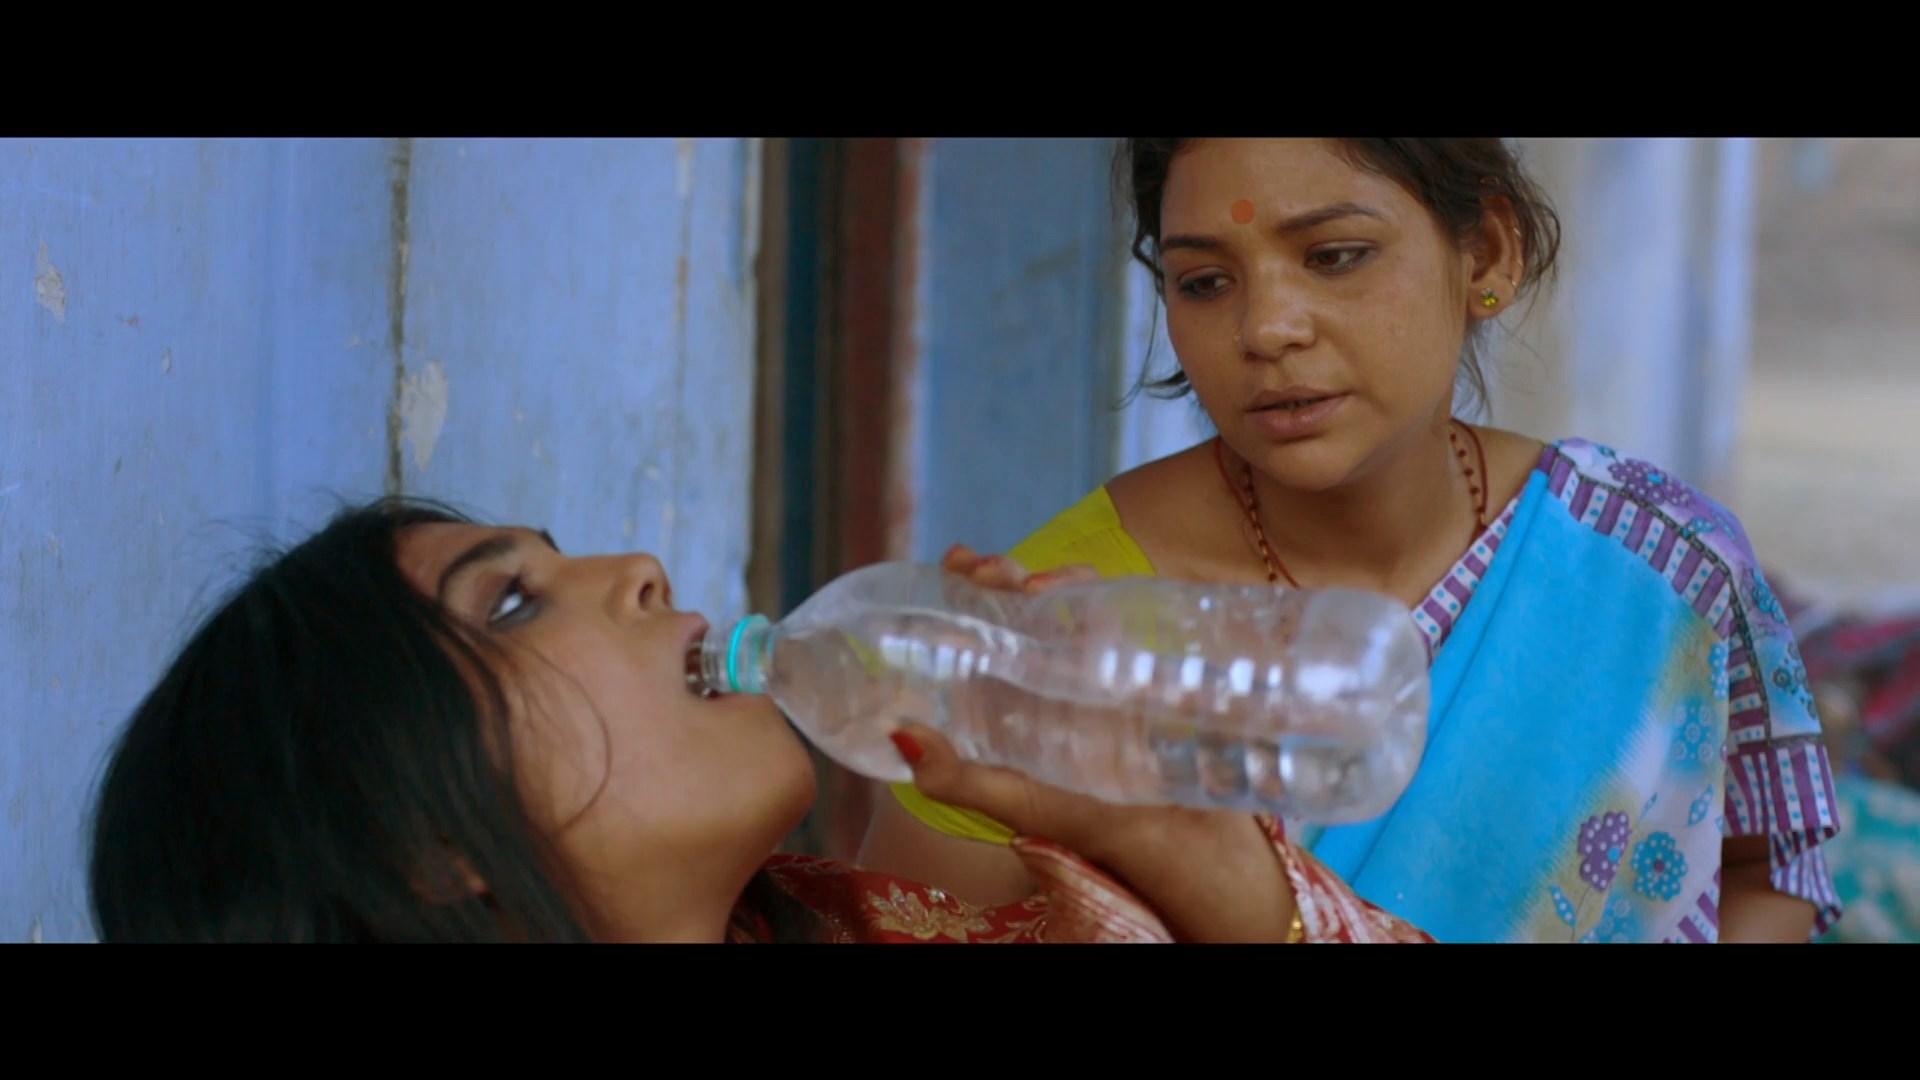 Uronchondi.2018.Bengali.1080p.WEB.DL.AVC.AAC.DUS.ICTV.mkv snapshot 00.23.36.000